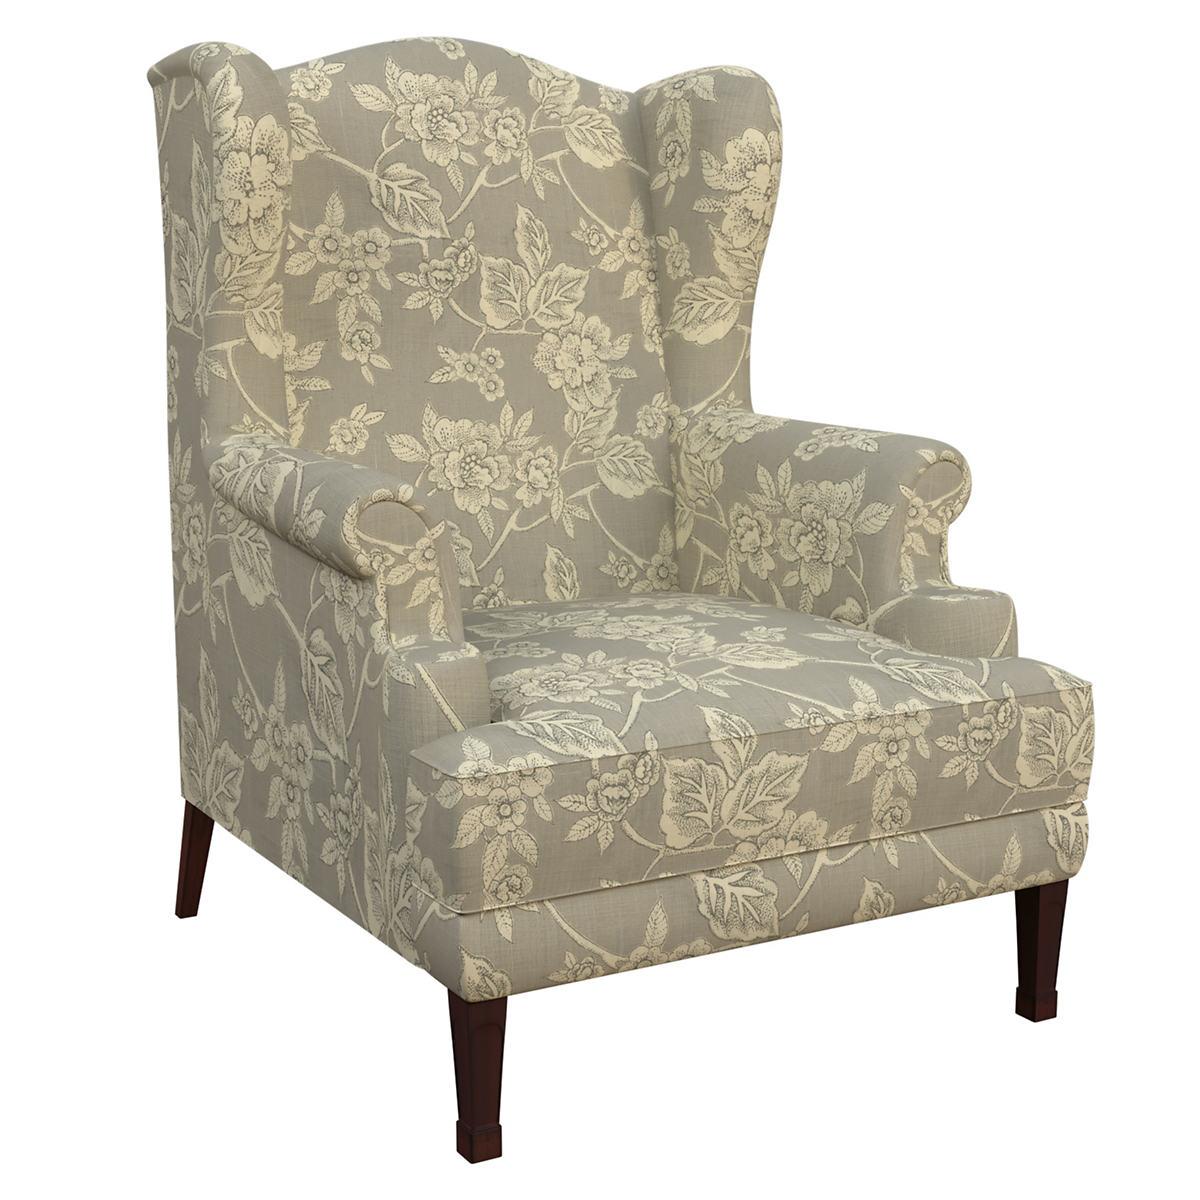 Charlotte Linen Lismore Chair